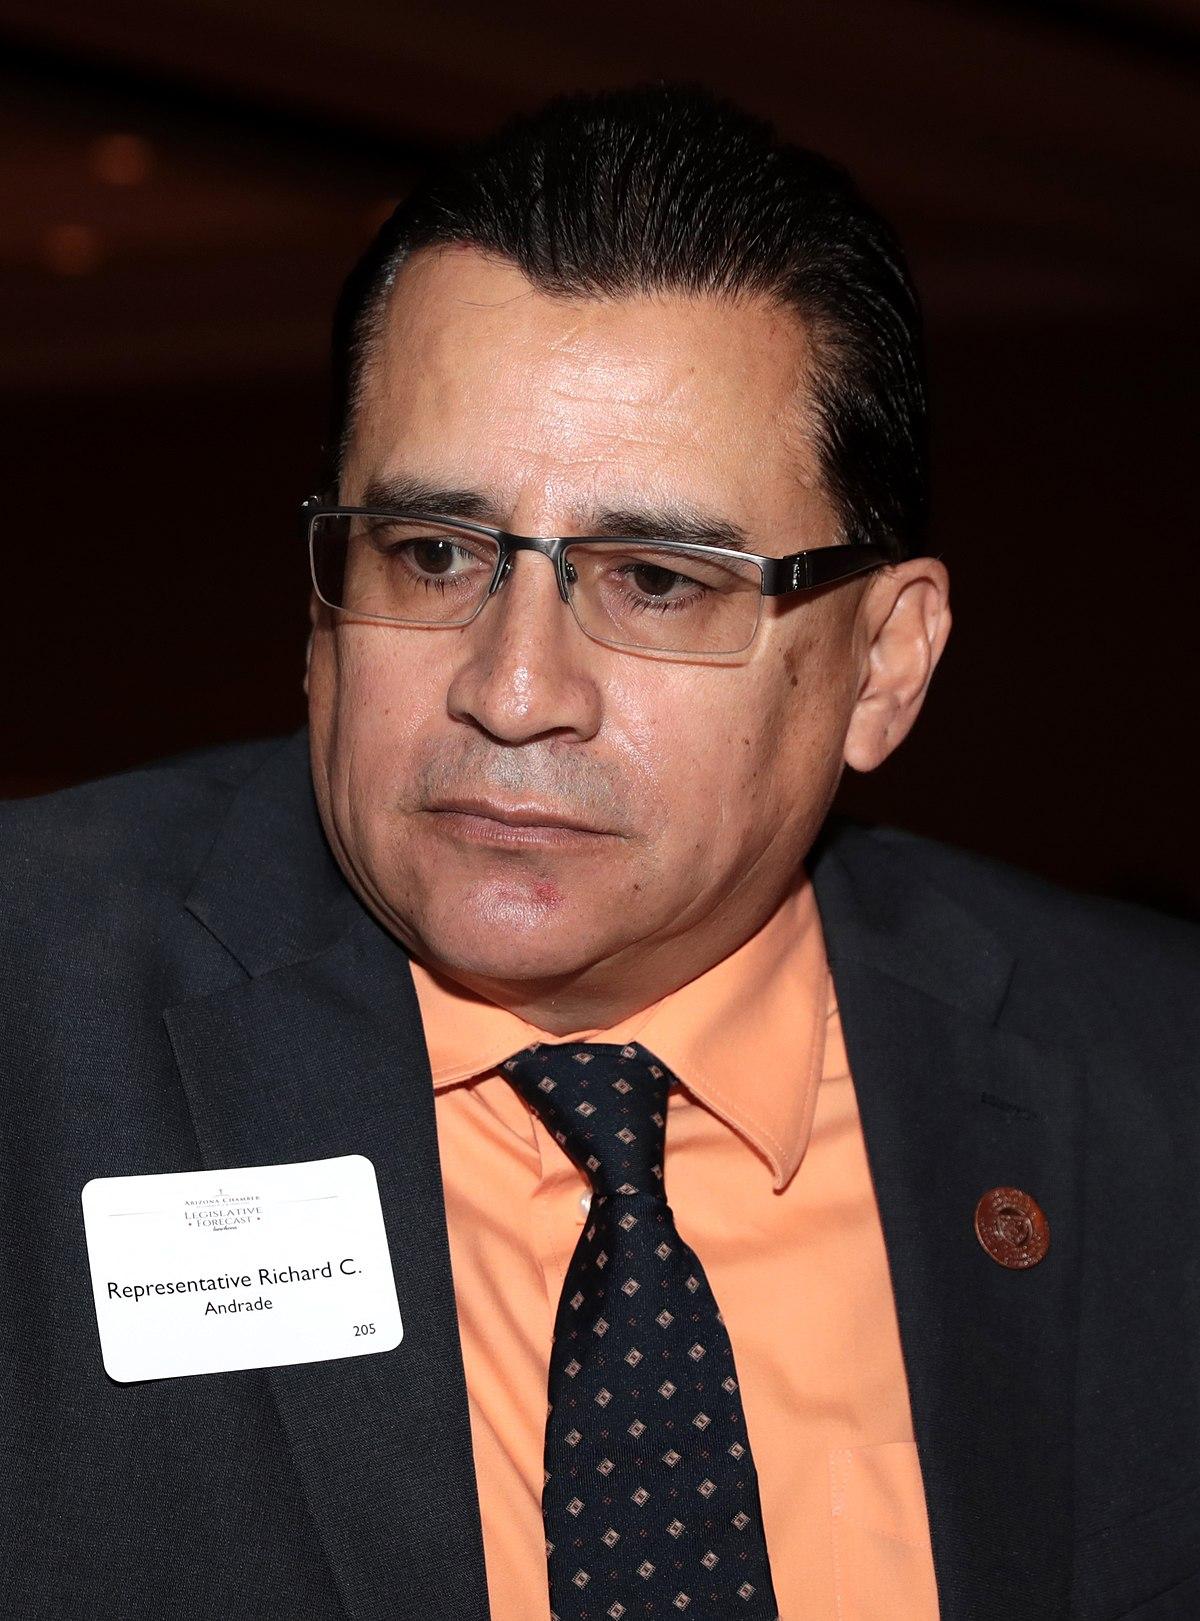 Arizona State Representatives >> Richard C. Andrade - Wikipedia